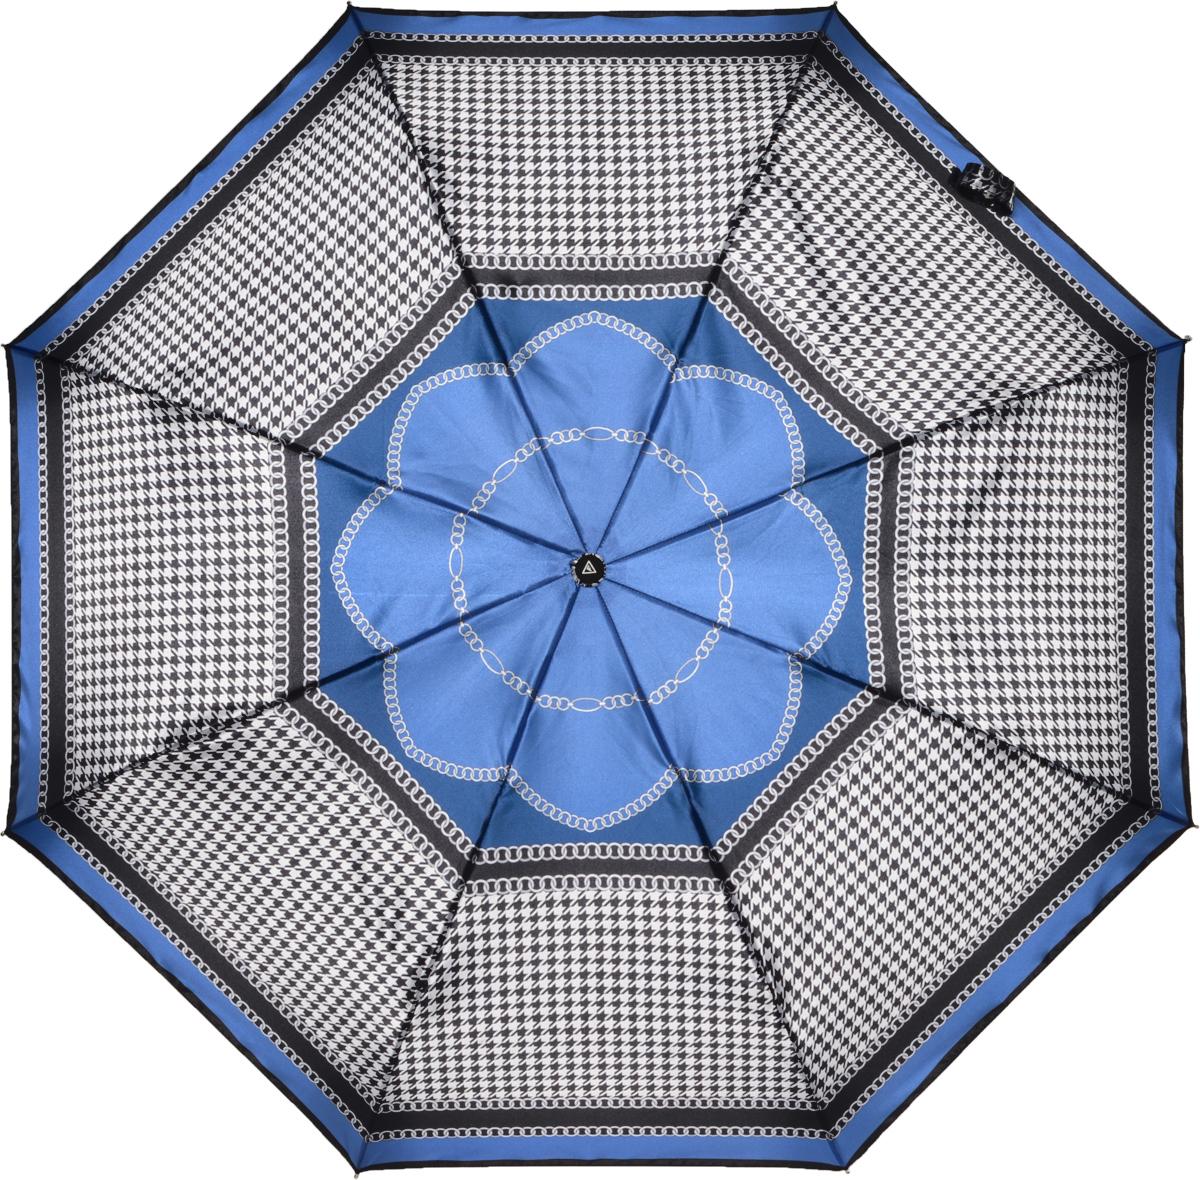 Зонт Fabretti зонт женский fabretti автомат 3 сложения цвет синий s 18102 6